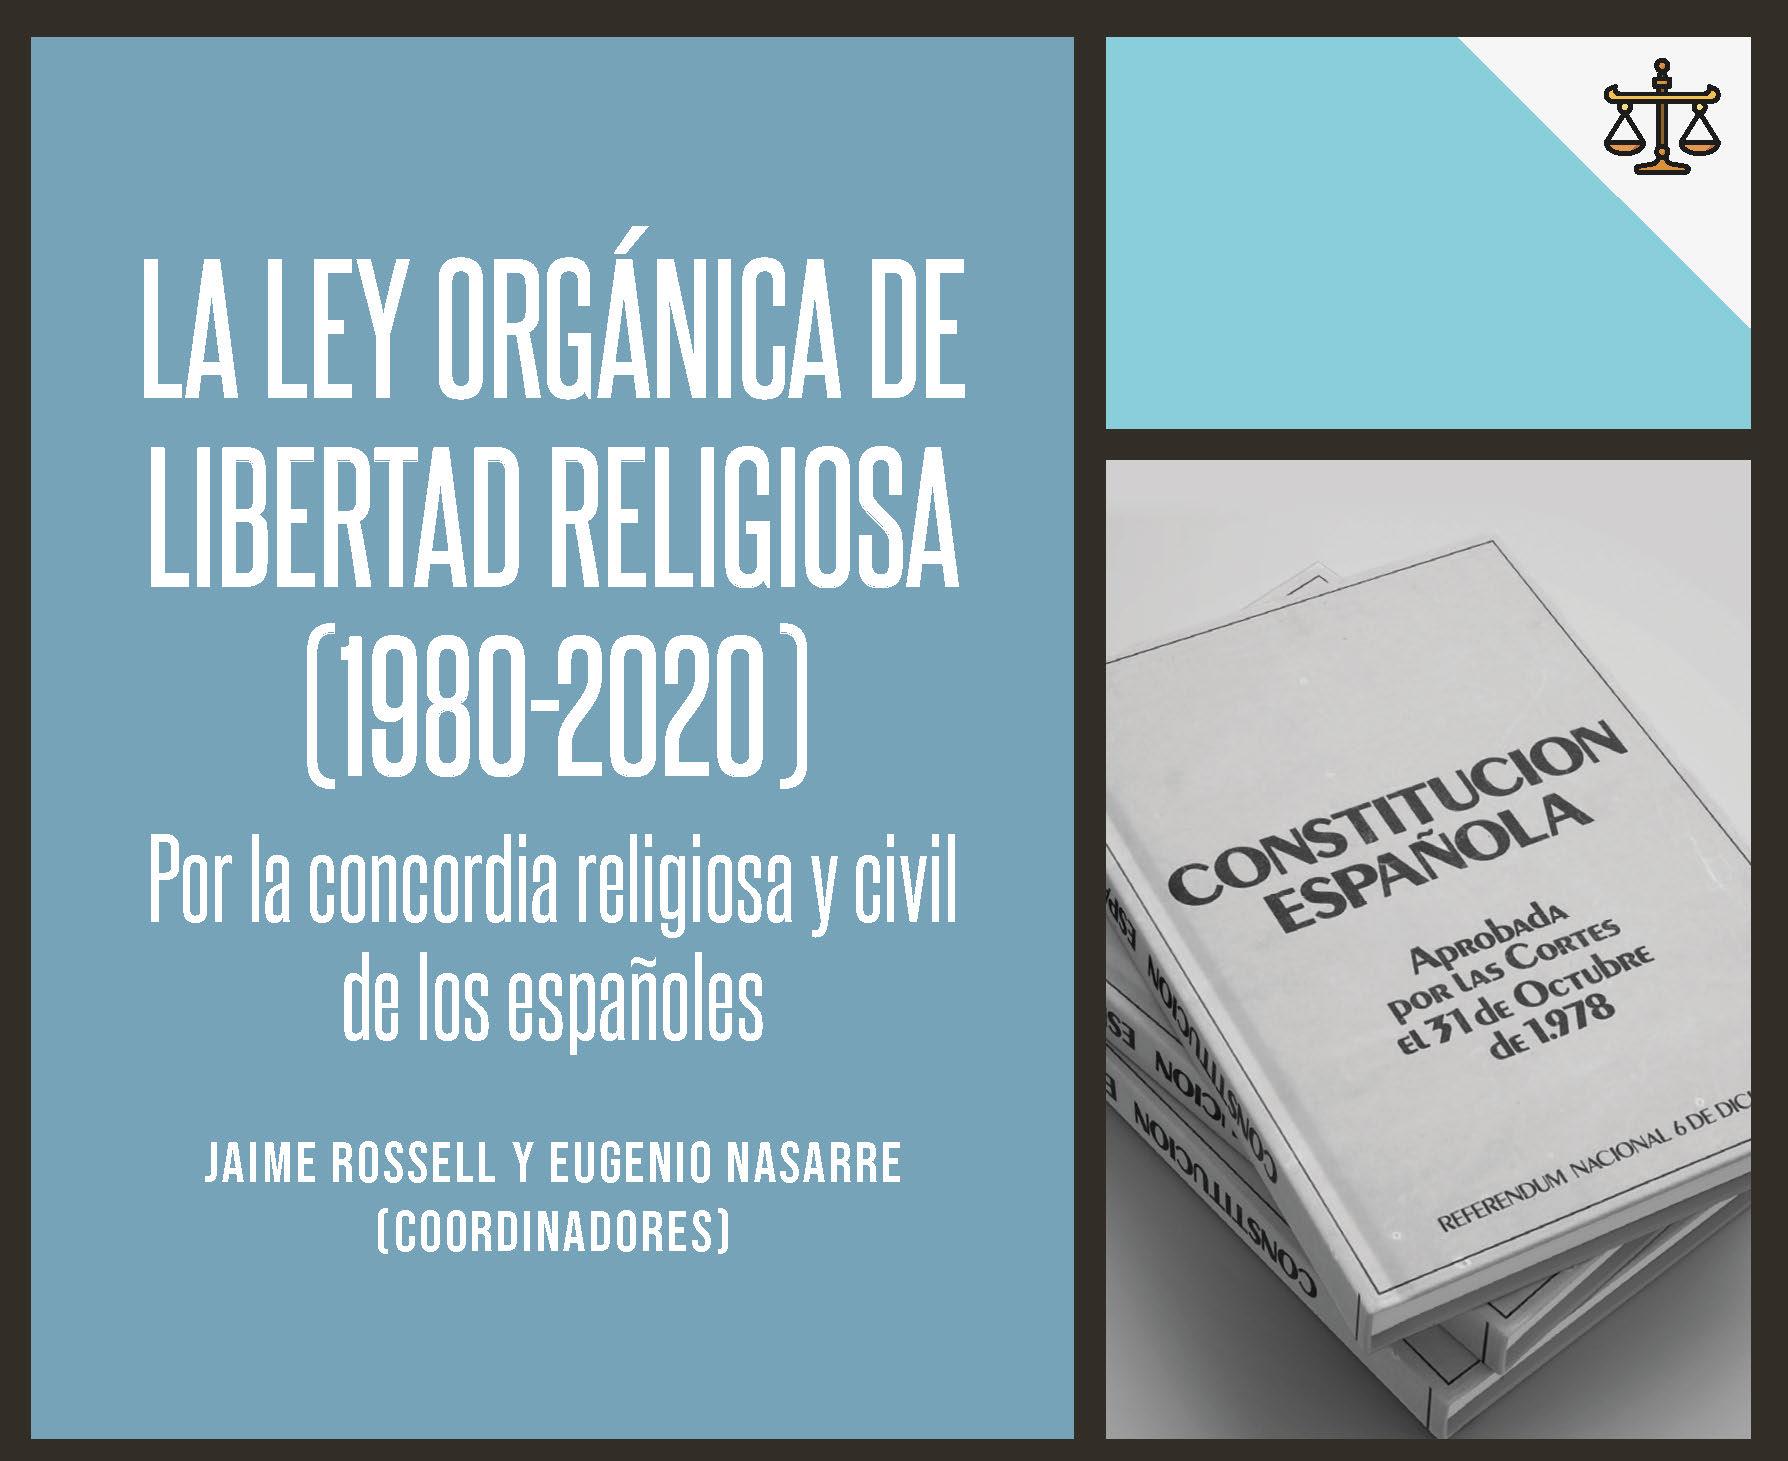 Ley de libertad religiosa